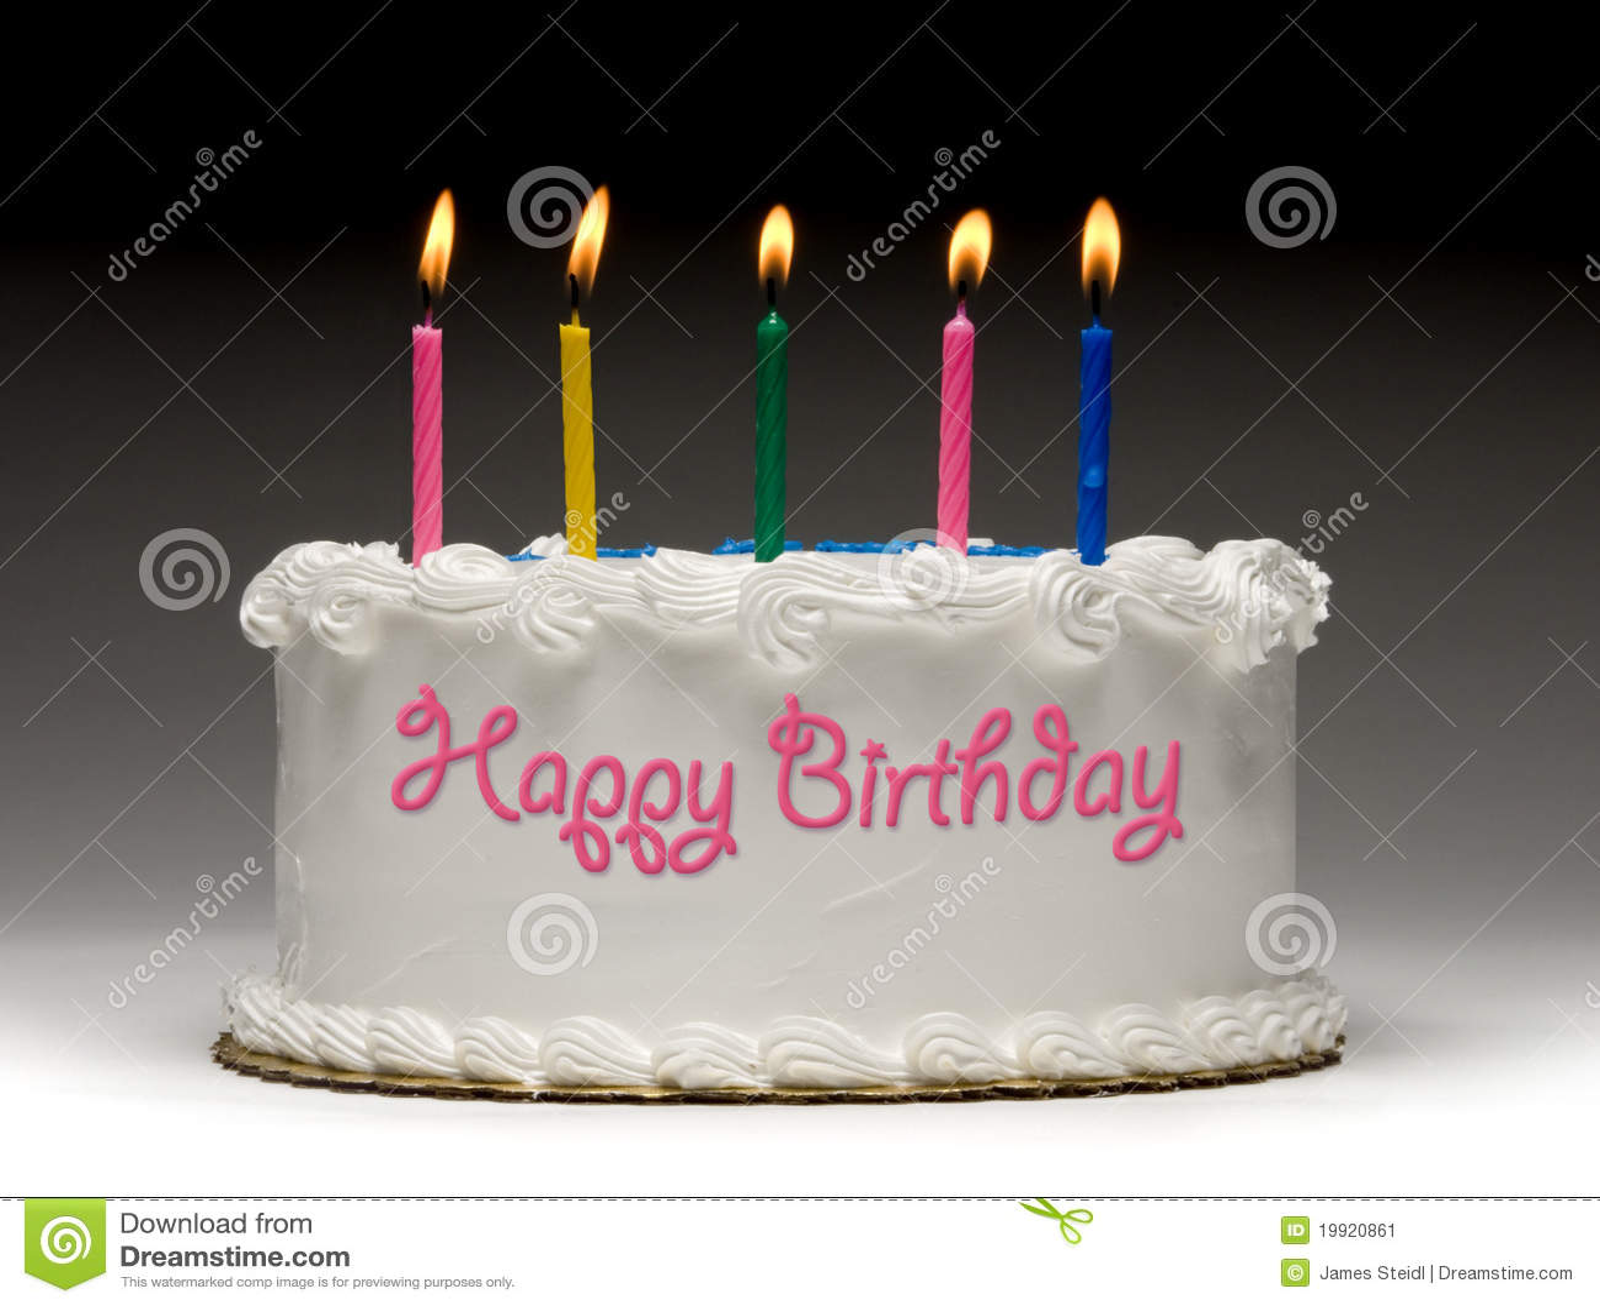 Birthday Cake Profile Stock Image Image 19920861